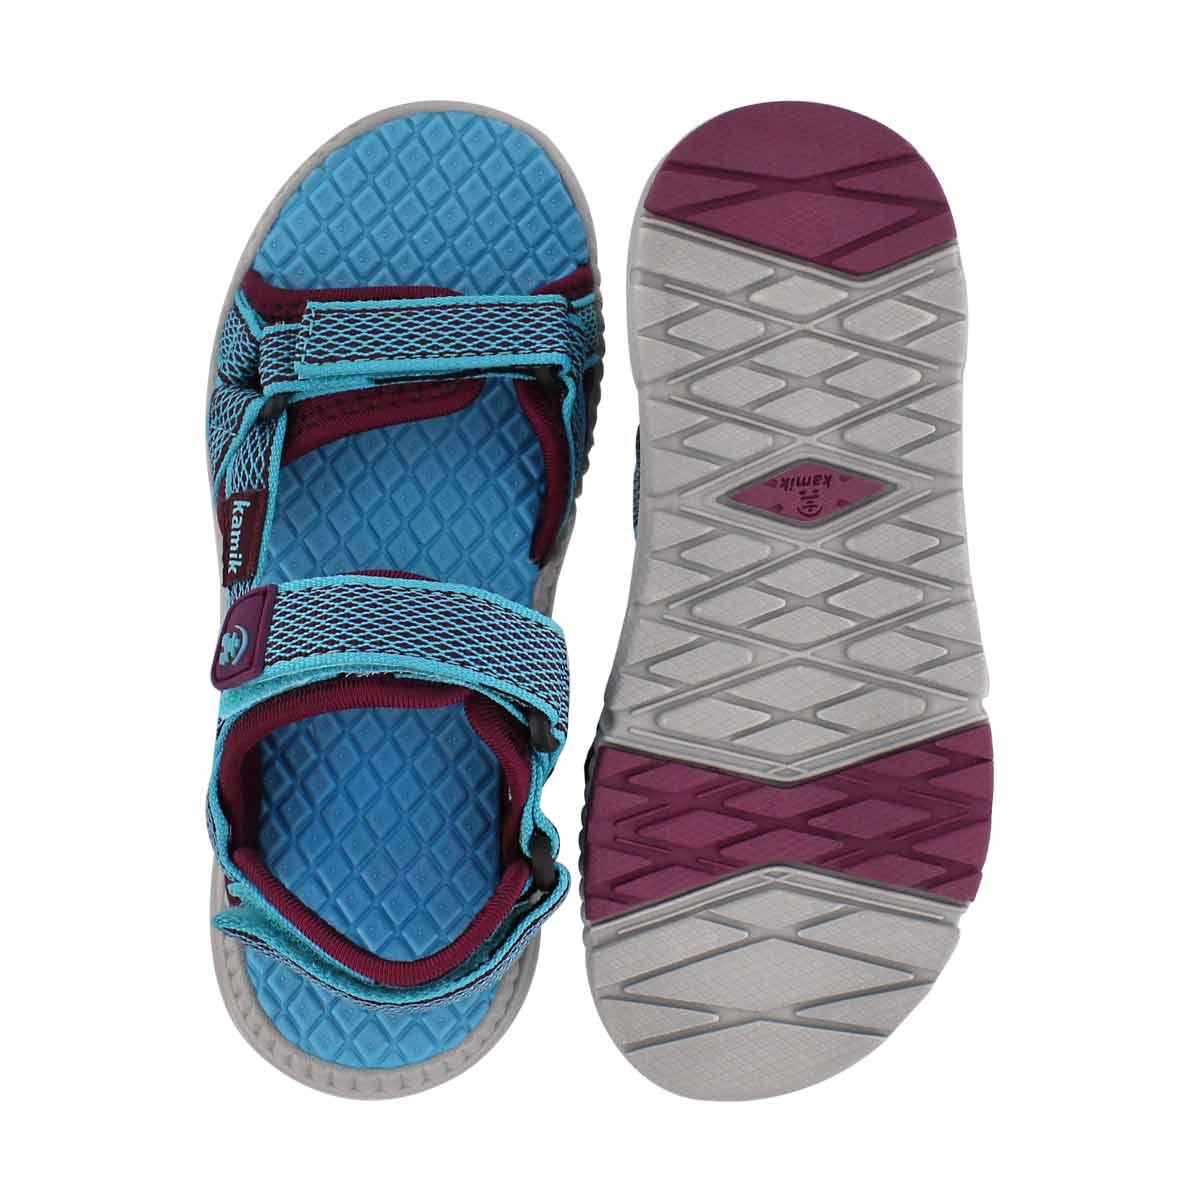 Grls Match teal 3 strap sandal